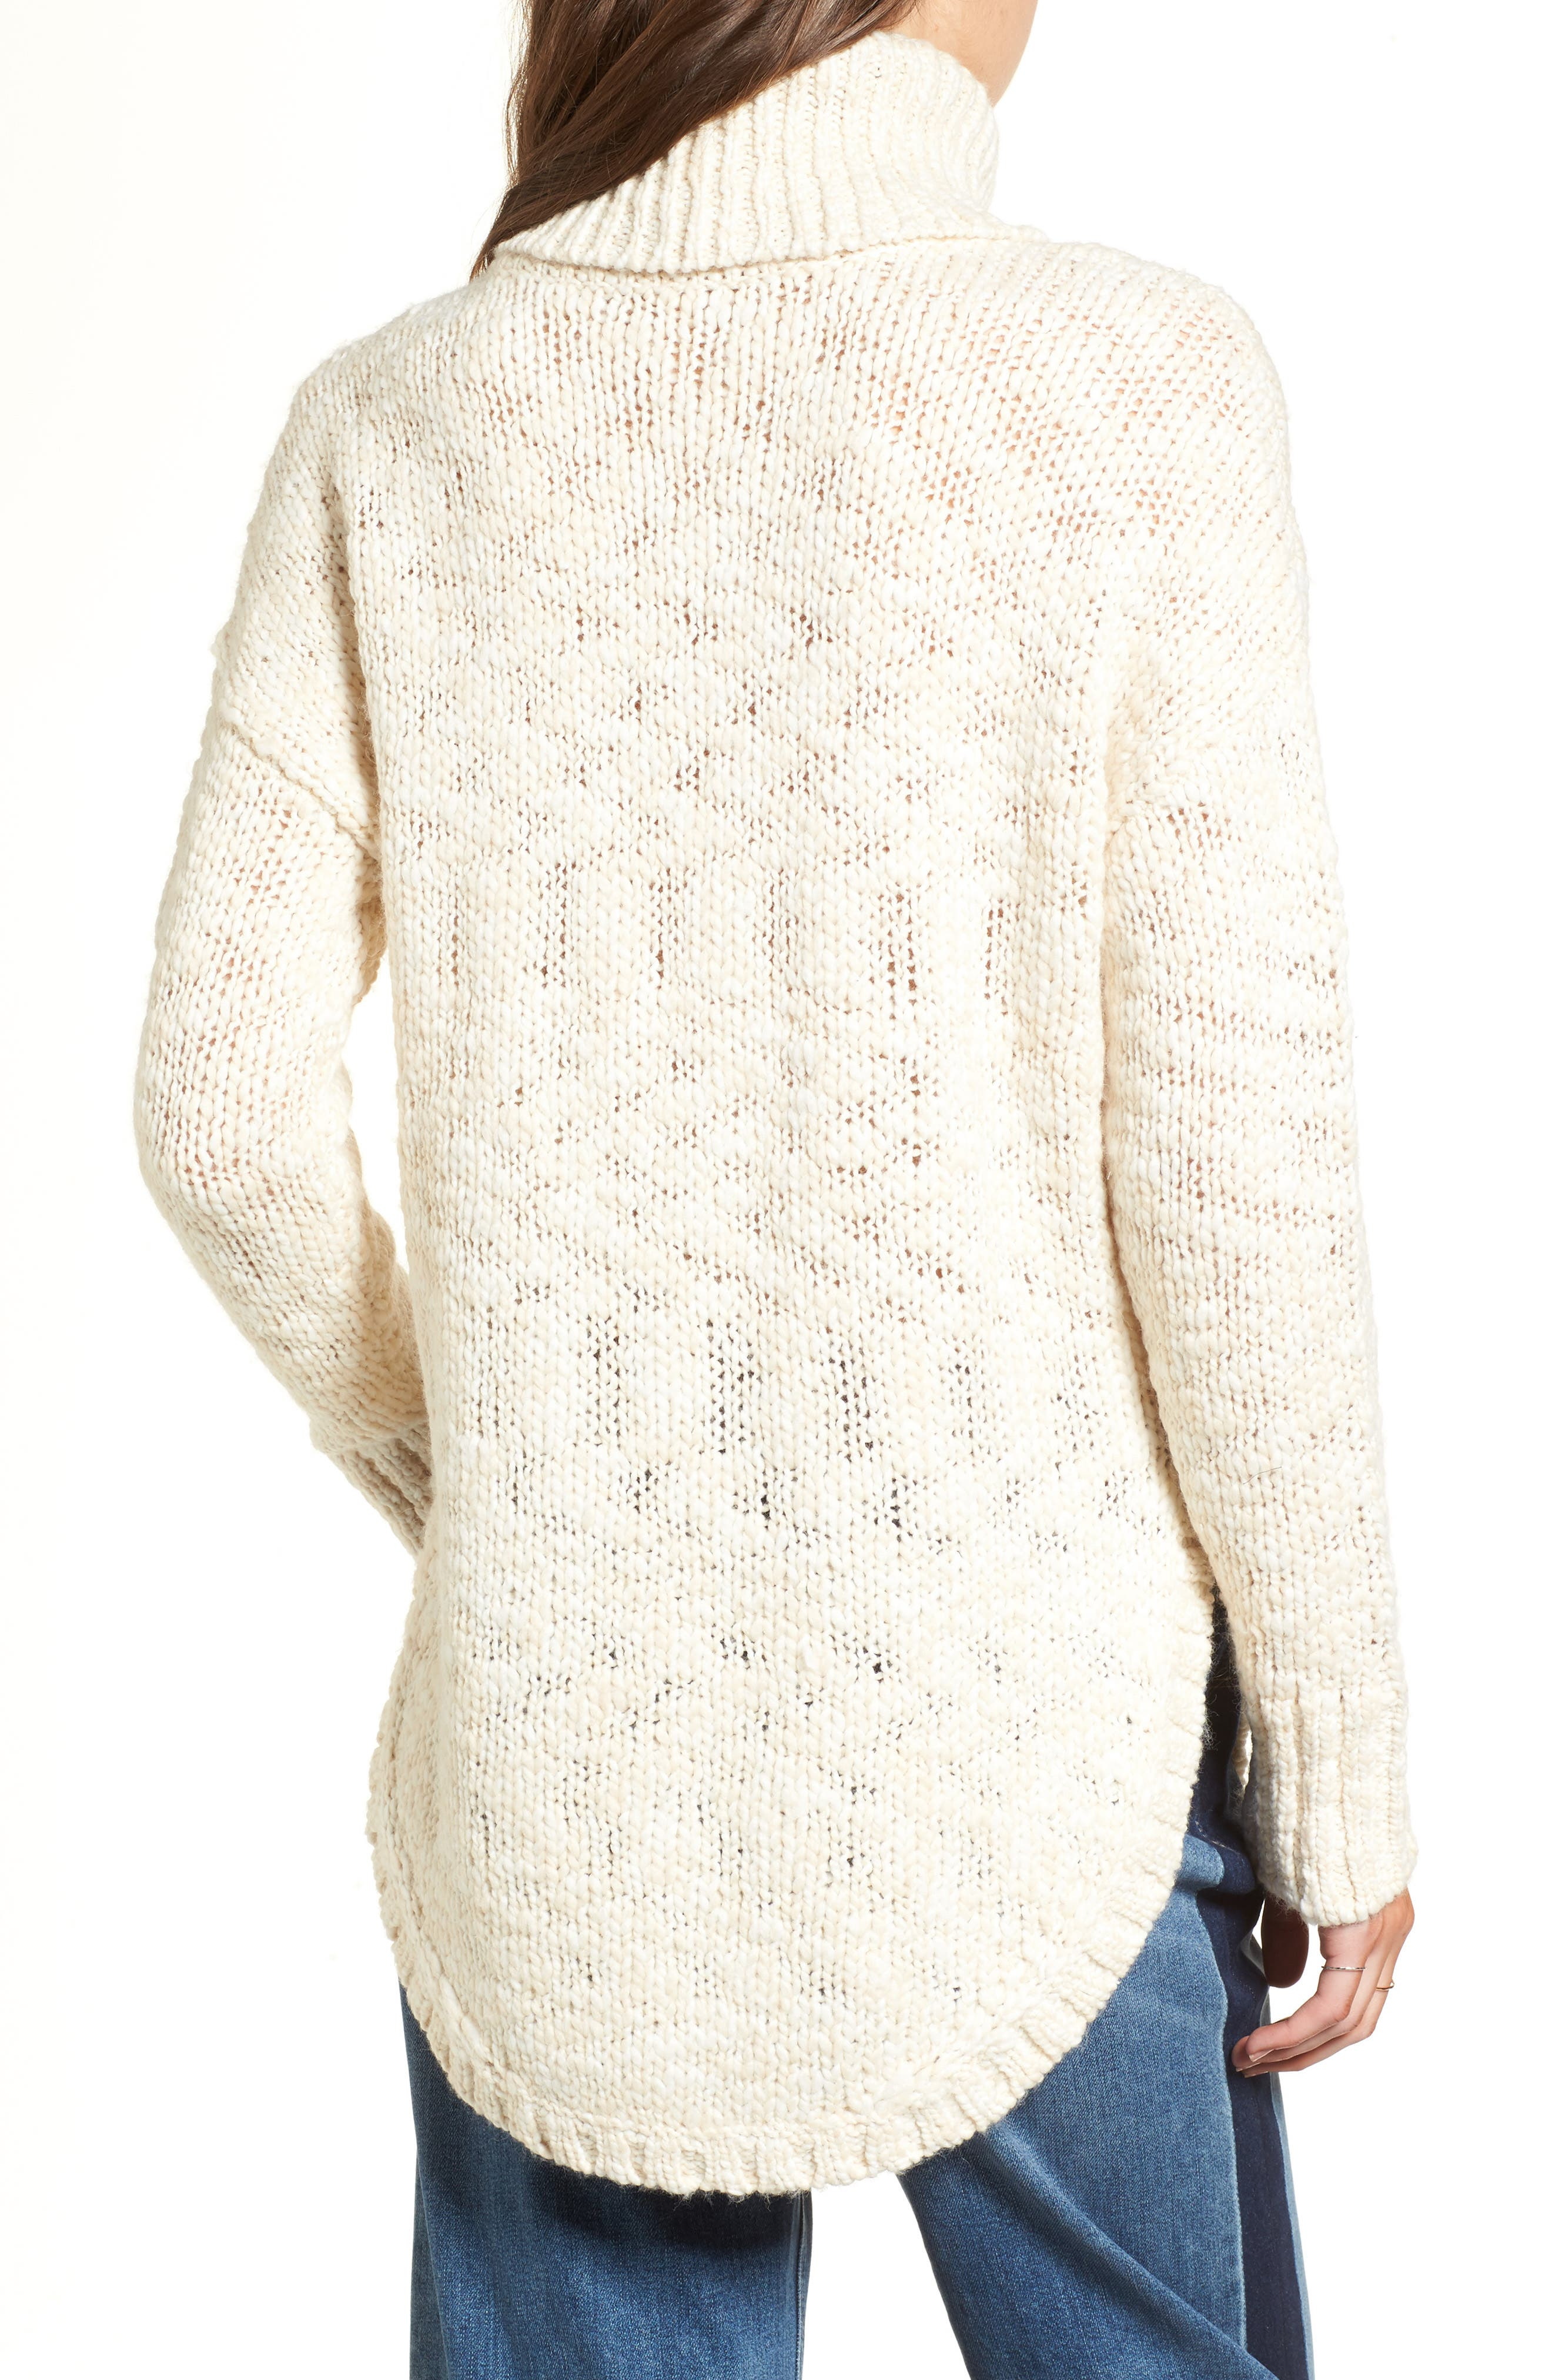 Treasure&Bond Turtleneck Sweater,                             Alternate thumbnail 2, color,                             BEIGE BEACH COMBO